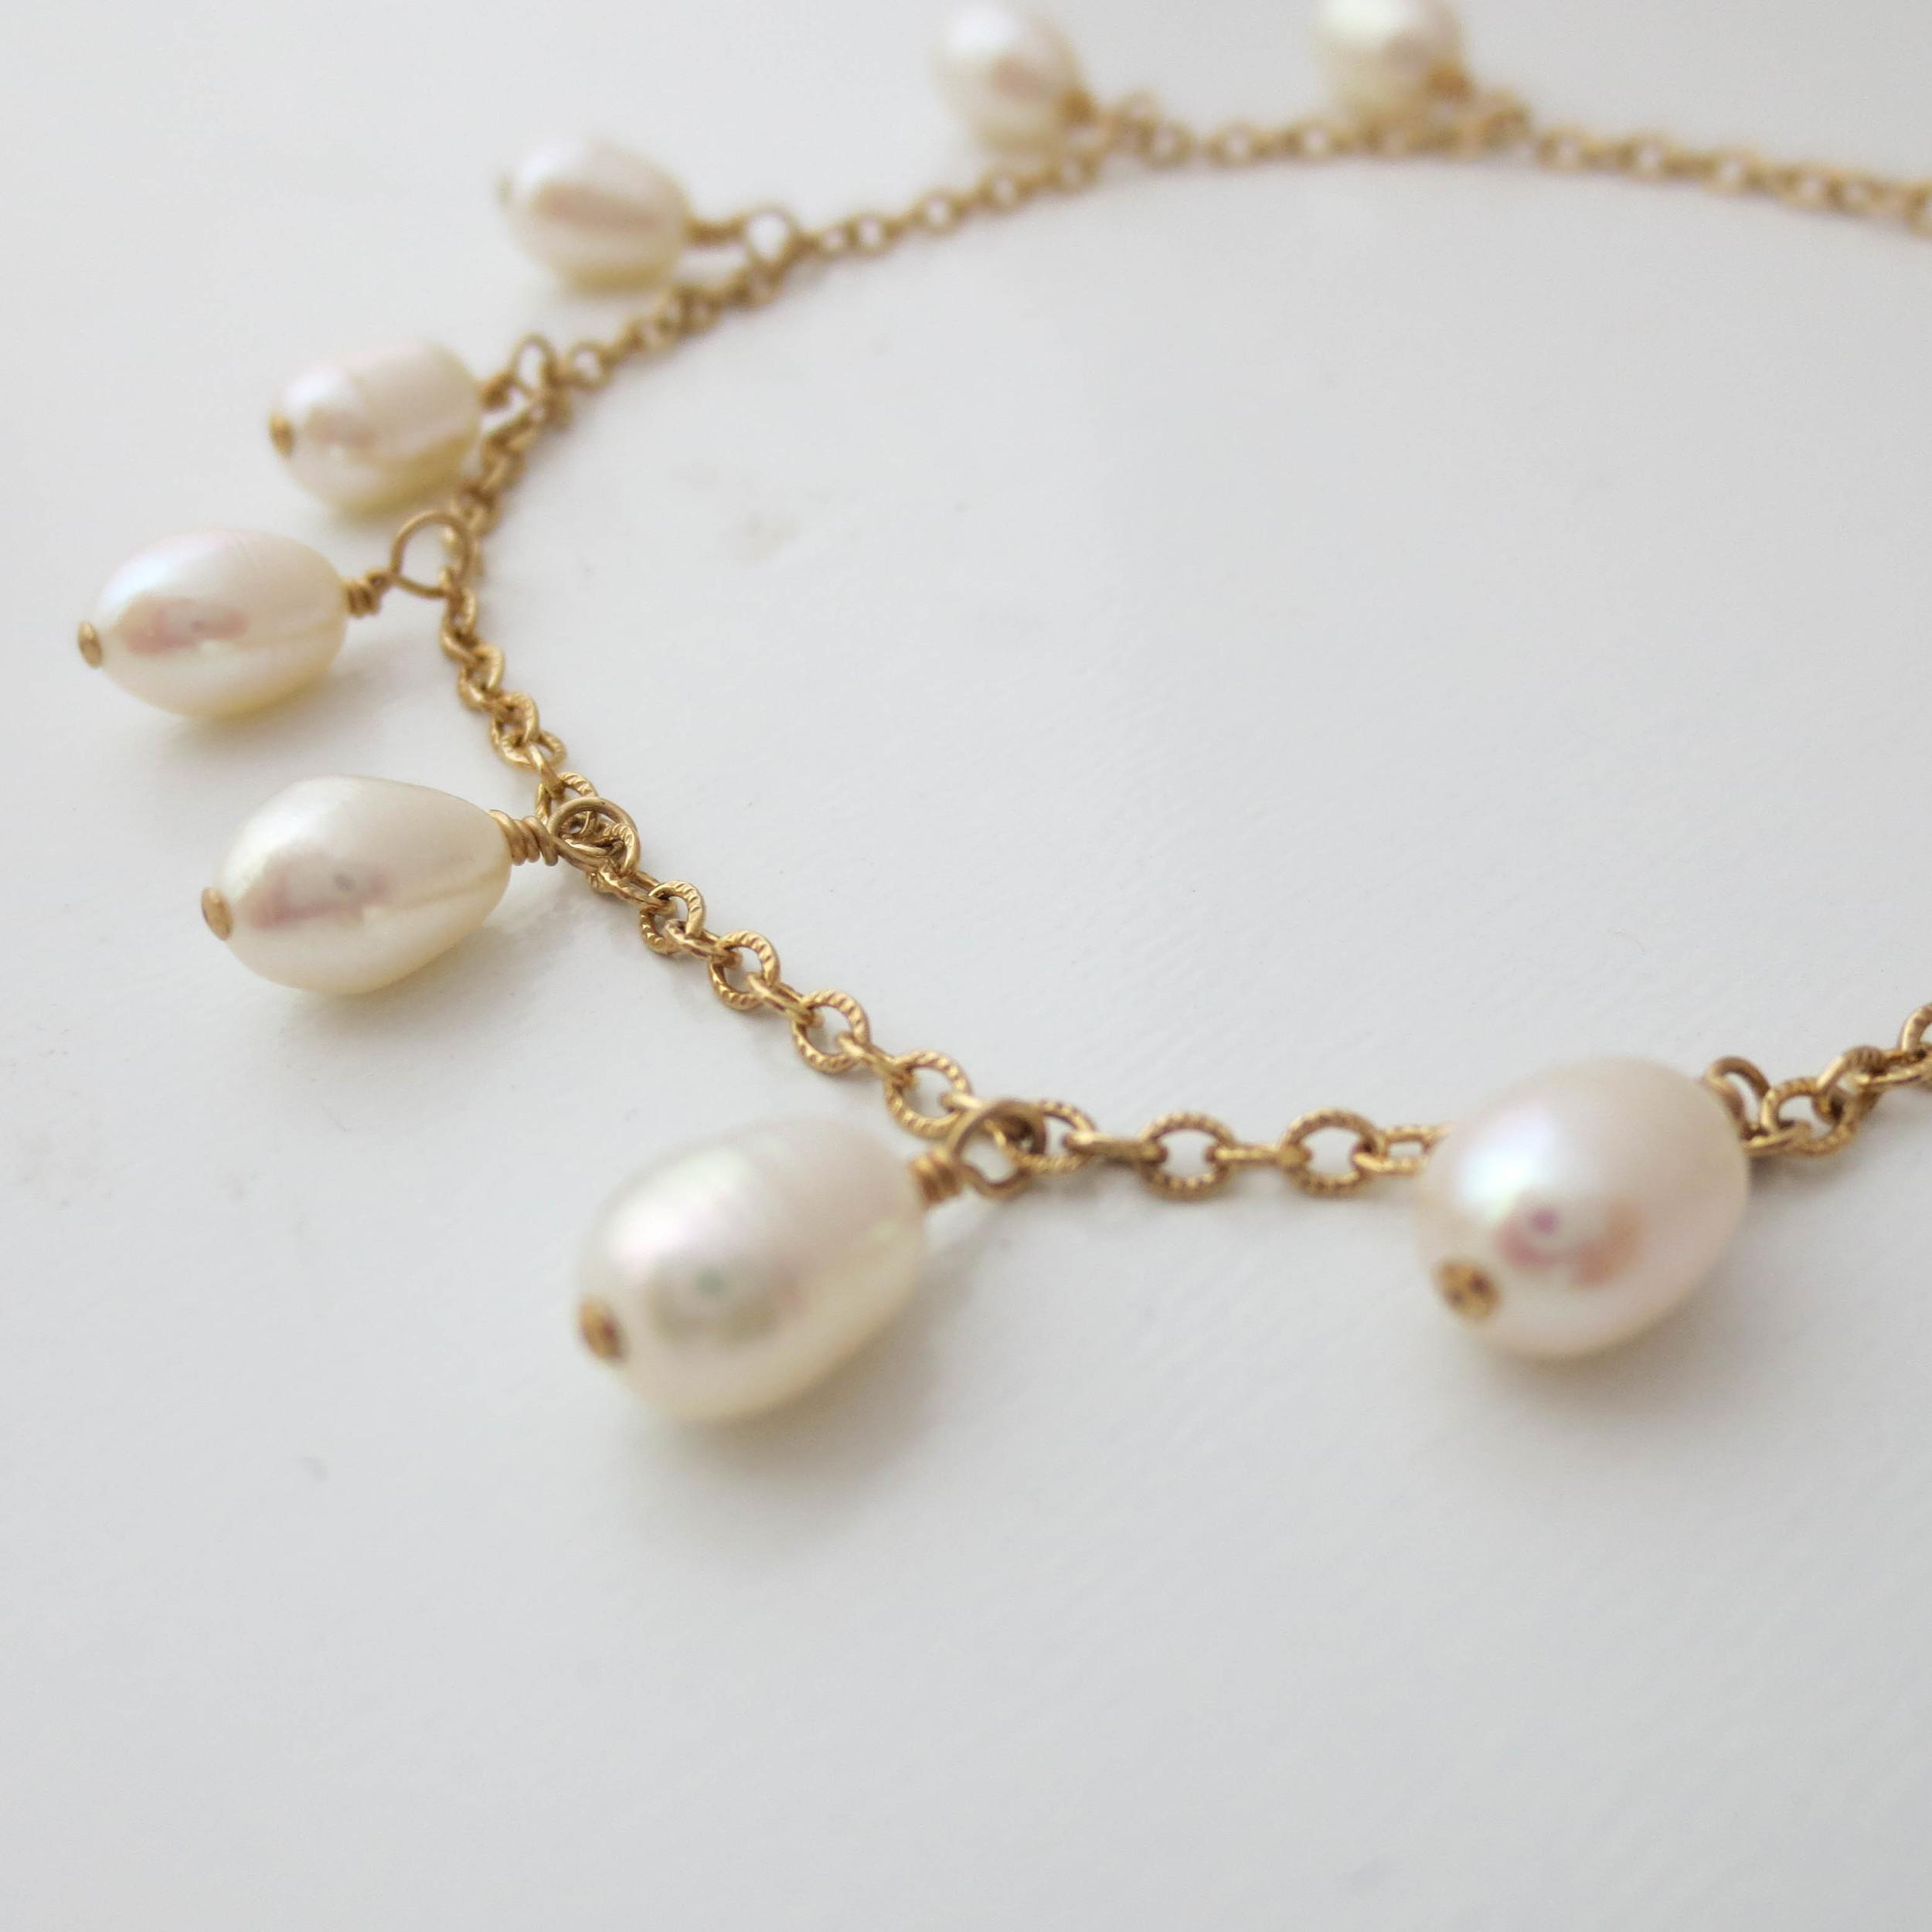 12802-drop-pearl-bracelet-4.jpg